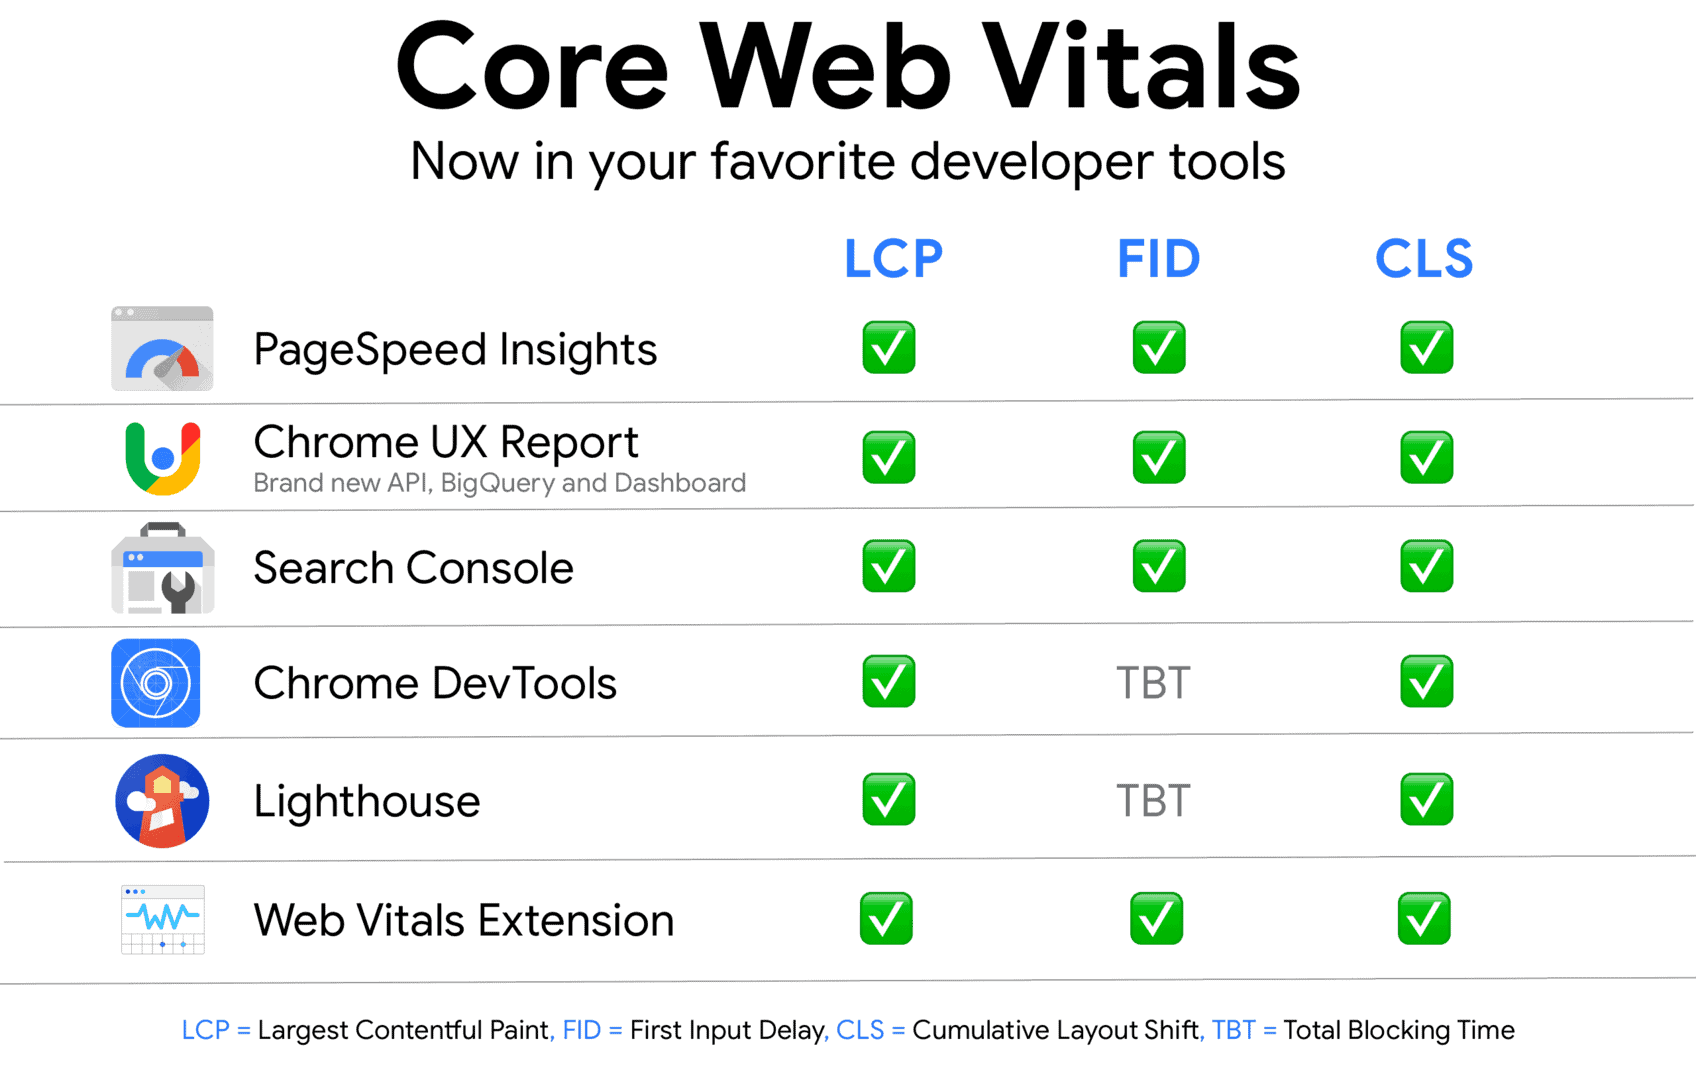 Core Web Vitals 網站核心體驗 - 一些 Google 提供用於檢測網站核心體驗指標報告的工具,包括 Page Speed Insight, Lighthouse…等